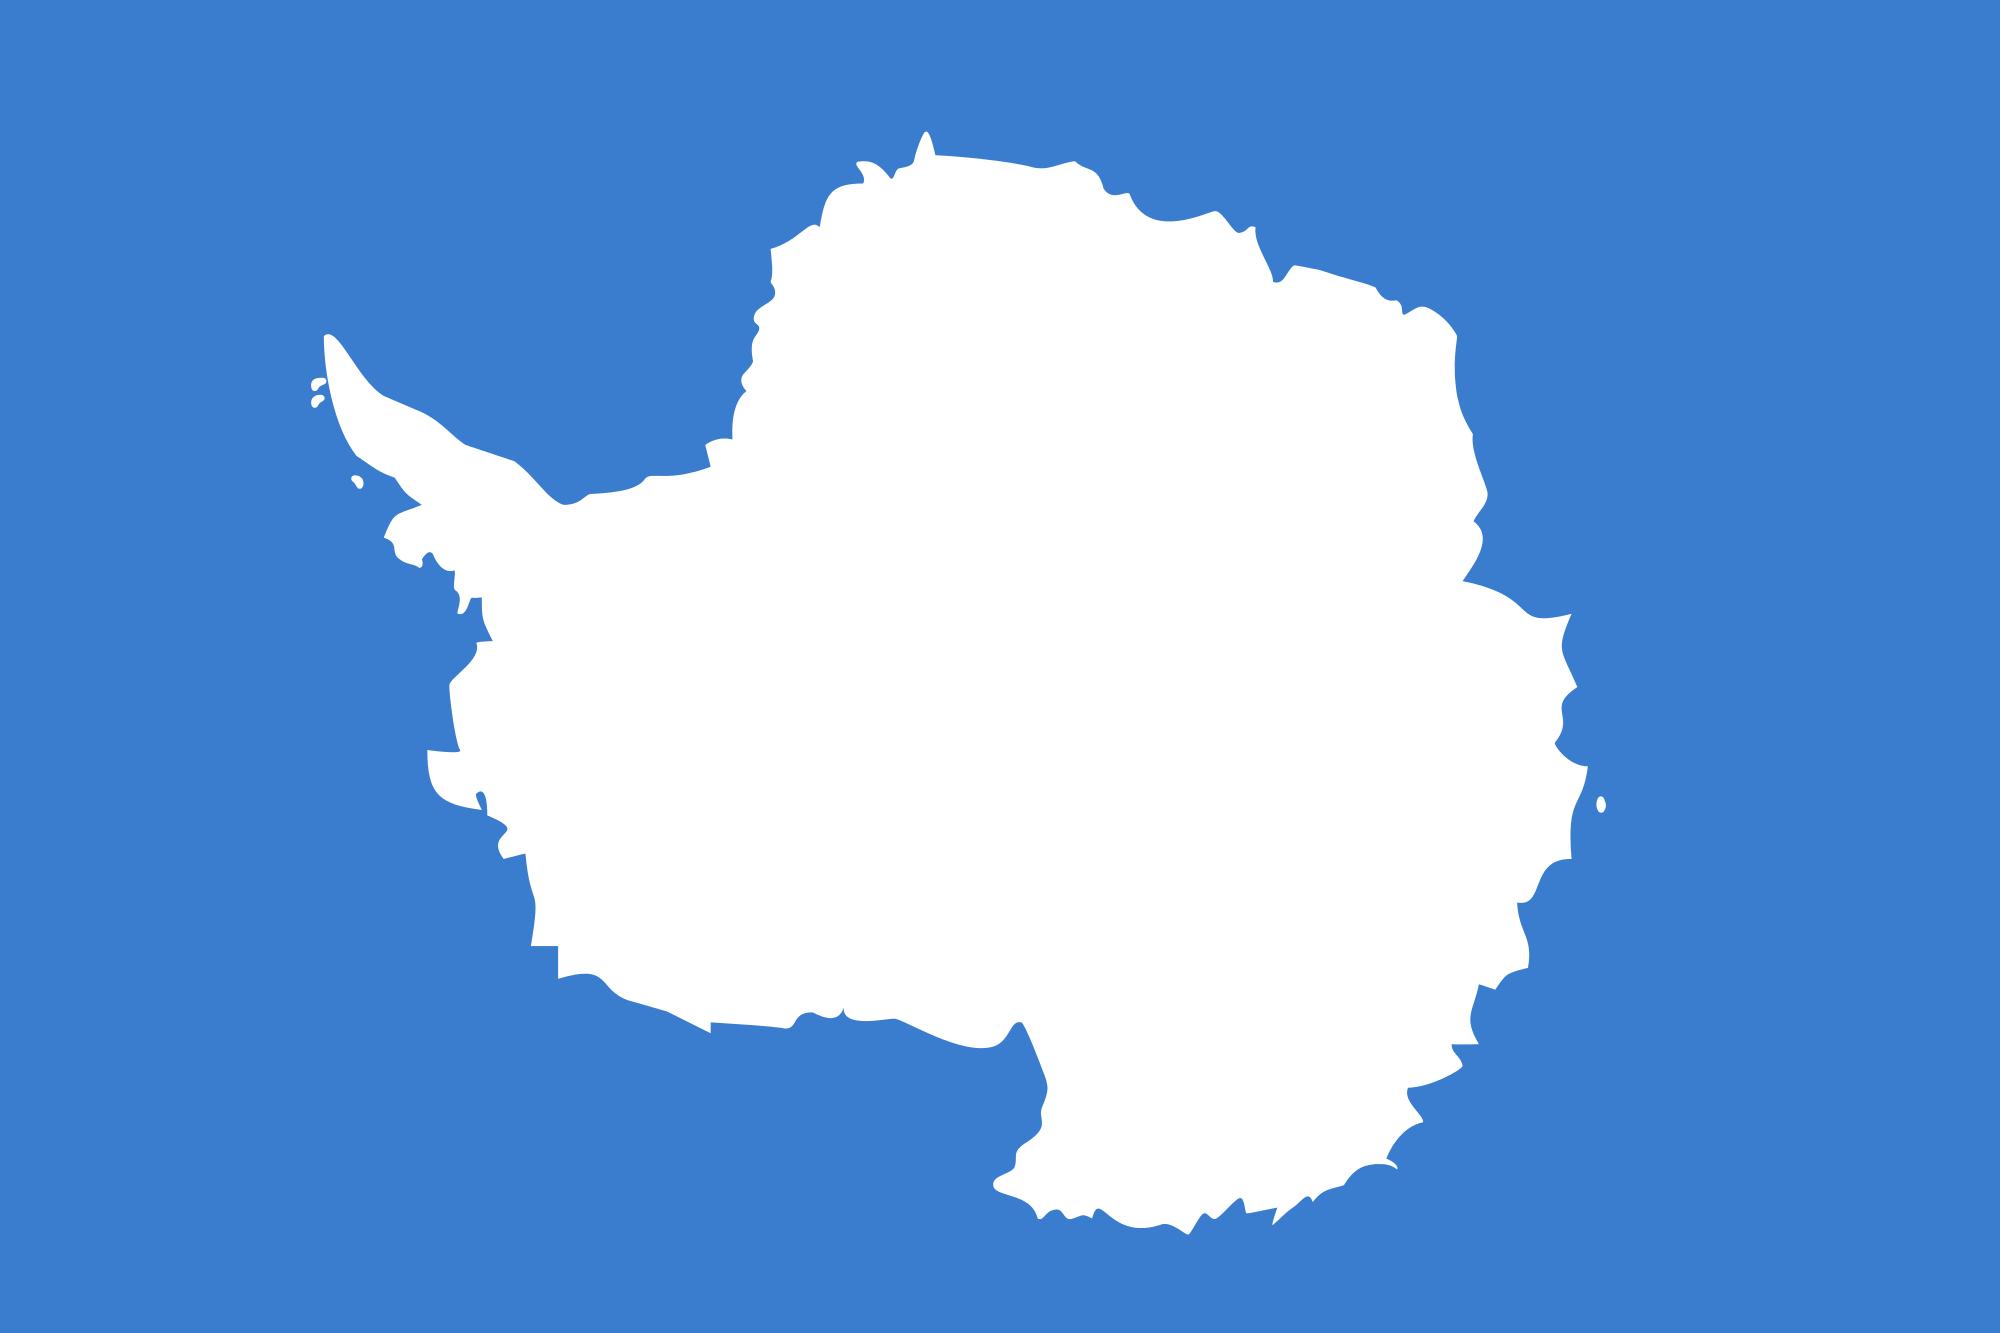 Antarctica images Flag Of Antarctica Unofficial HD wallpaper and 2000x1333